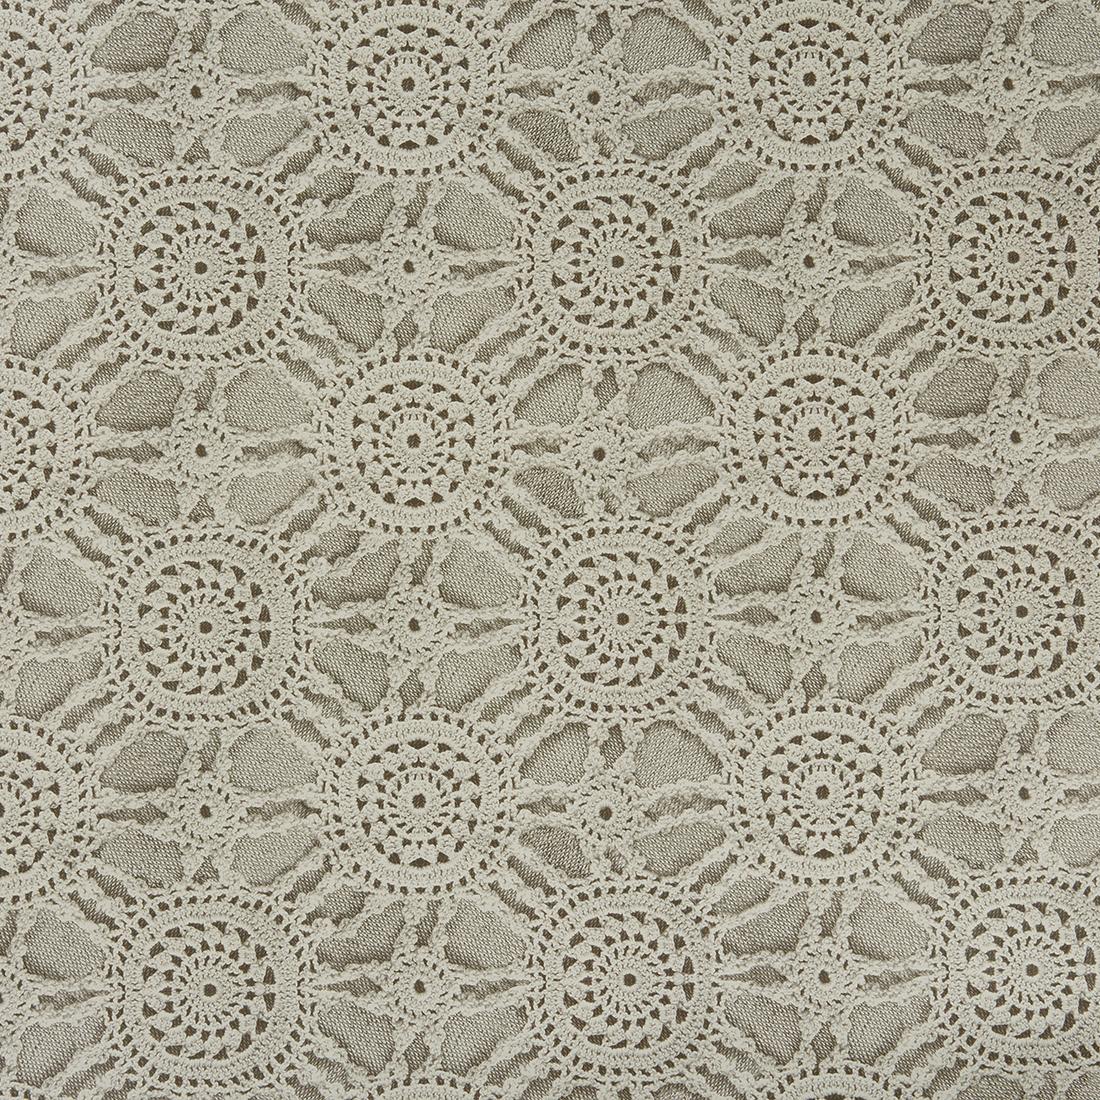 Crochet Natural Oil Cloth